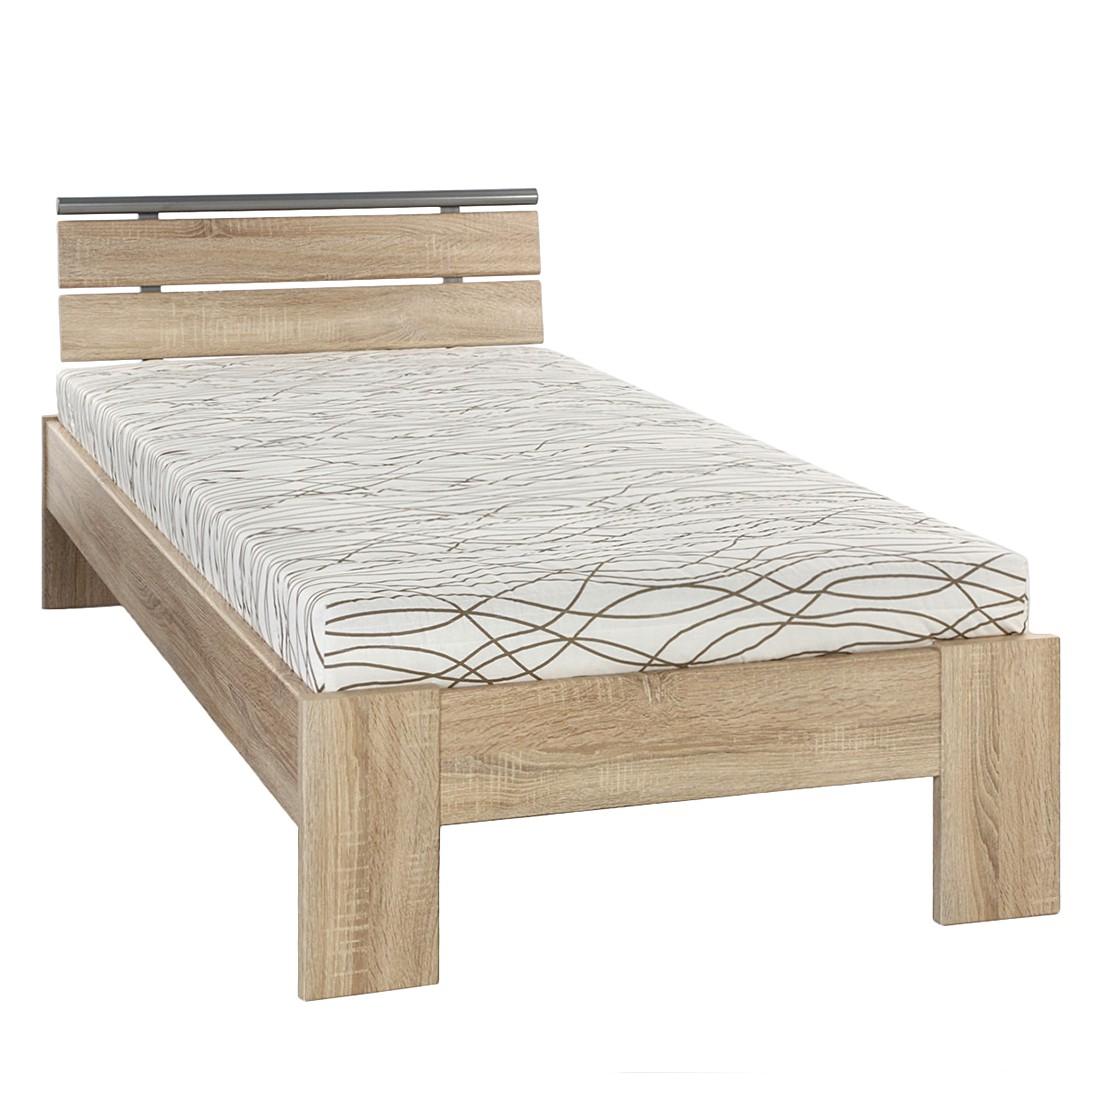 Bett Ohne Lattenrost Rucken : - Bett Megan - 90 x 200cm - Bettgestell ohne Matratze & Lattenrost ...